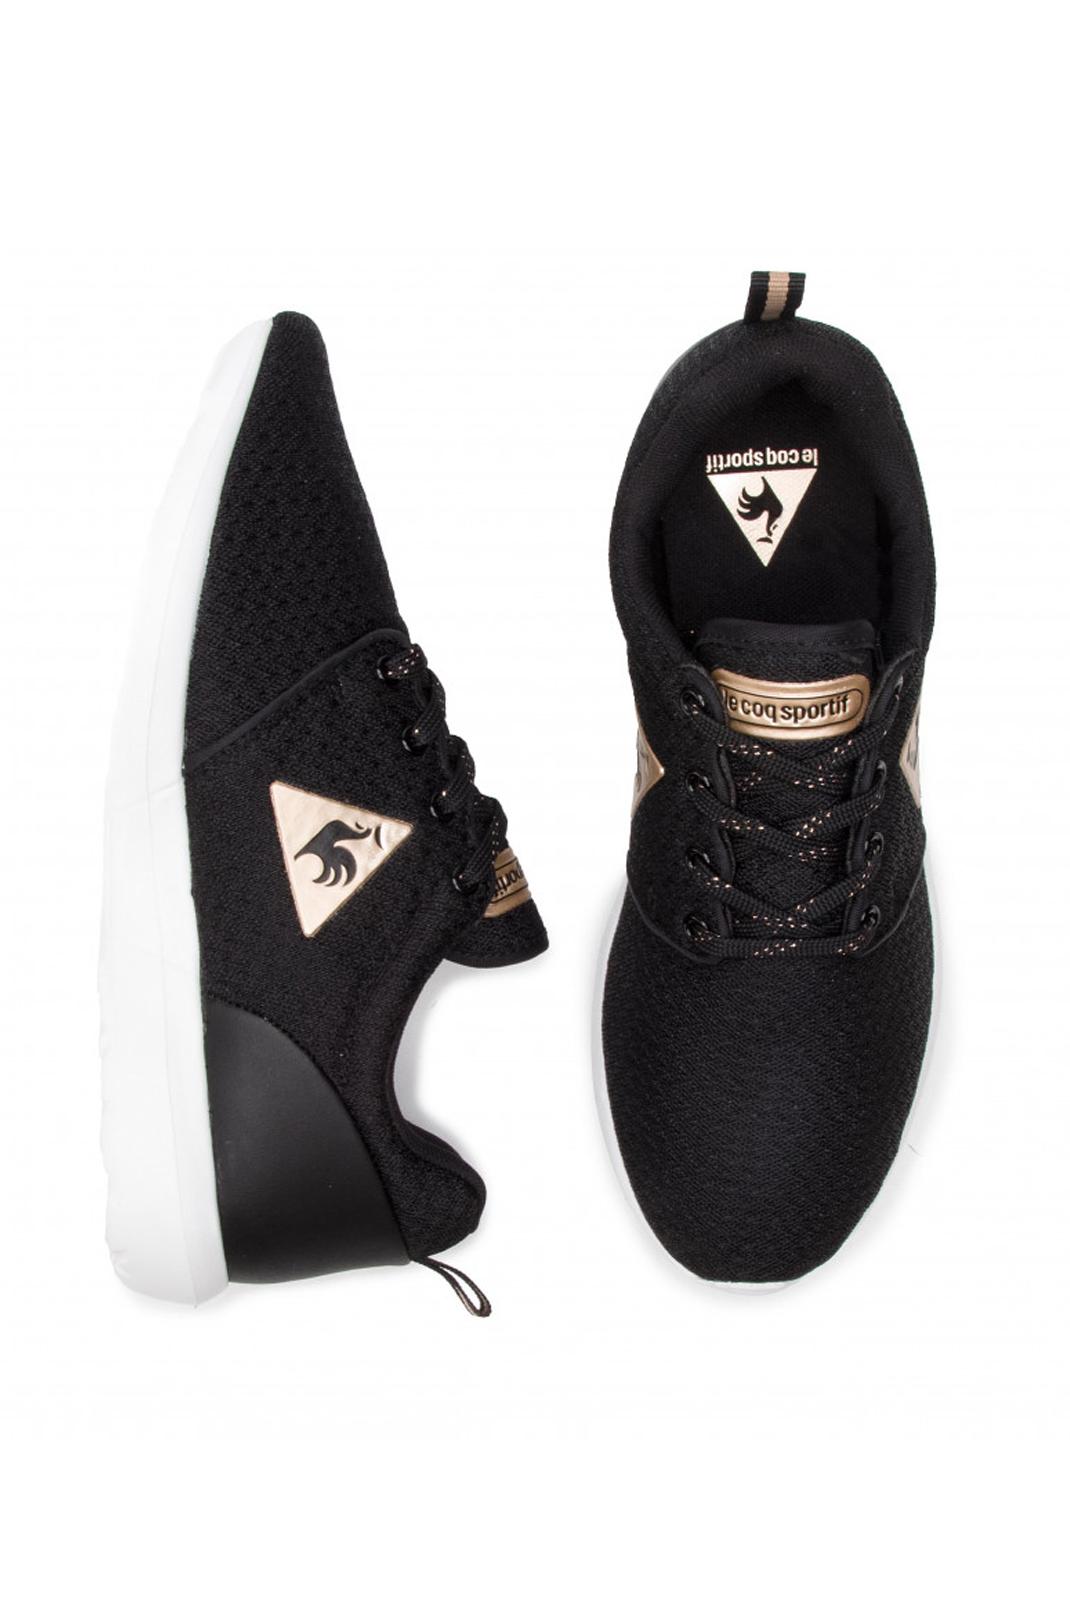 Baskets / Sneakers  Le coq sportif 1910786 DYNACOMF METALLIC BLACK ROSE/GOLD